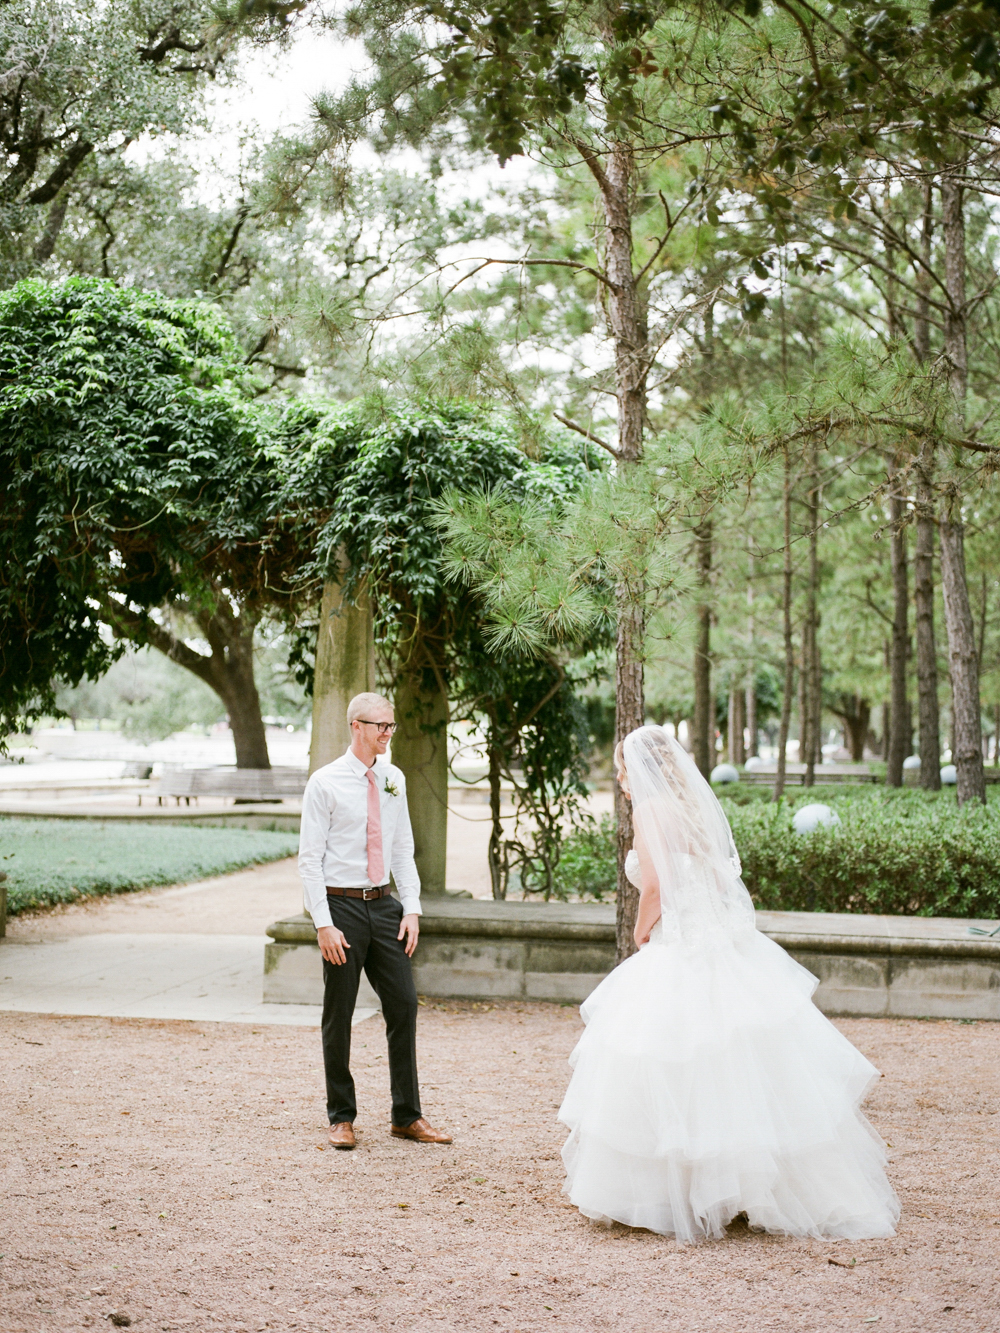 benefits of a first look_wedding photography_wedding photographer_film wedding photographer_Christine Gosch_www.christinegosch.com_Houston, Texas wedding photographer_ Houston, Texas-15.jpg